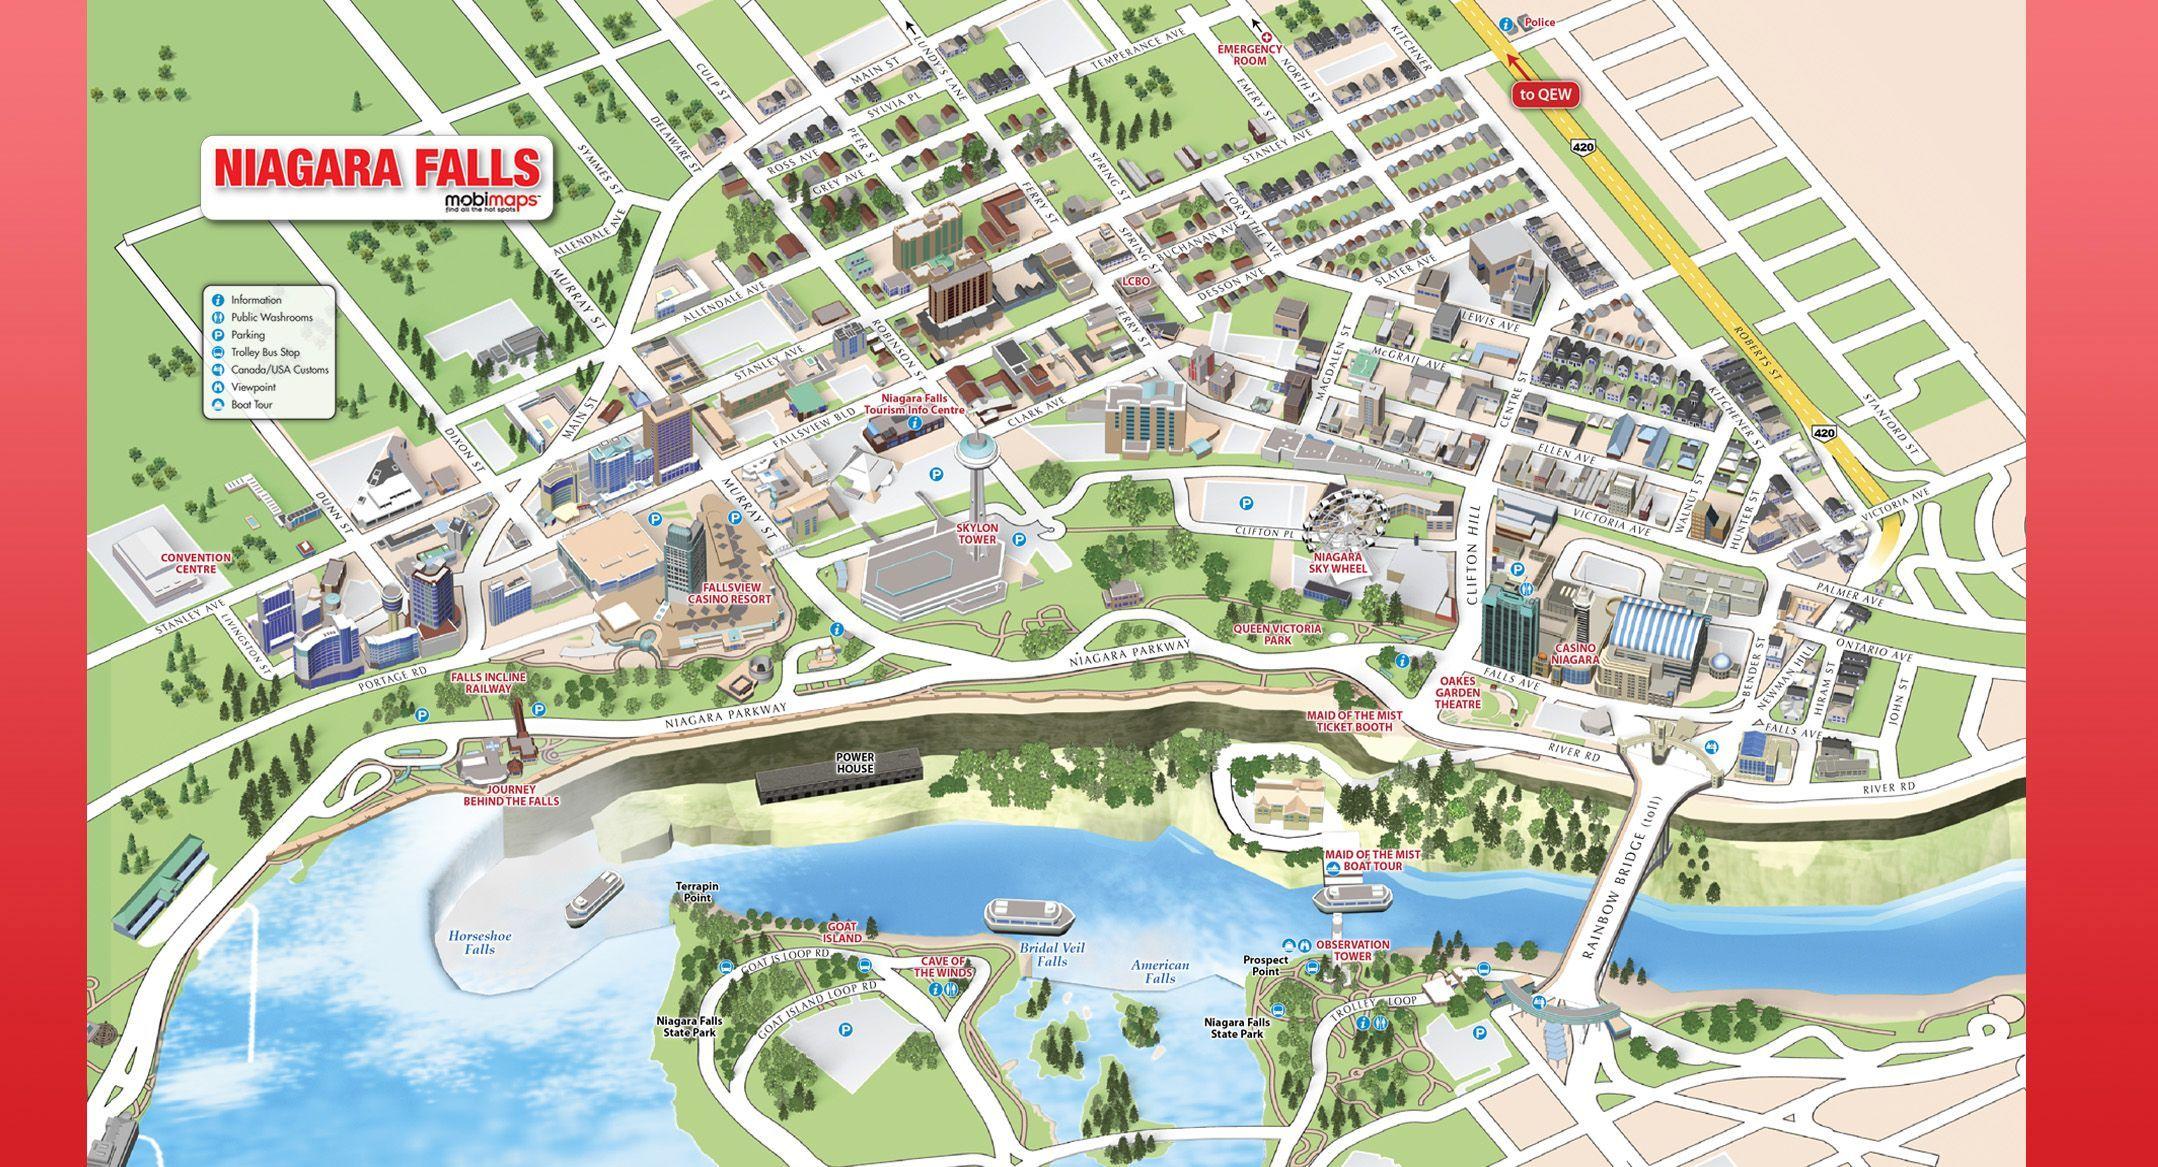 Niagara Falls Canada Map Pdf Pin by Mary Saggau on niagra falls | Niagara falls map, Niagara